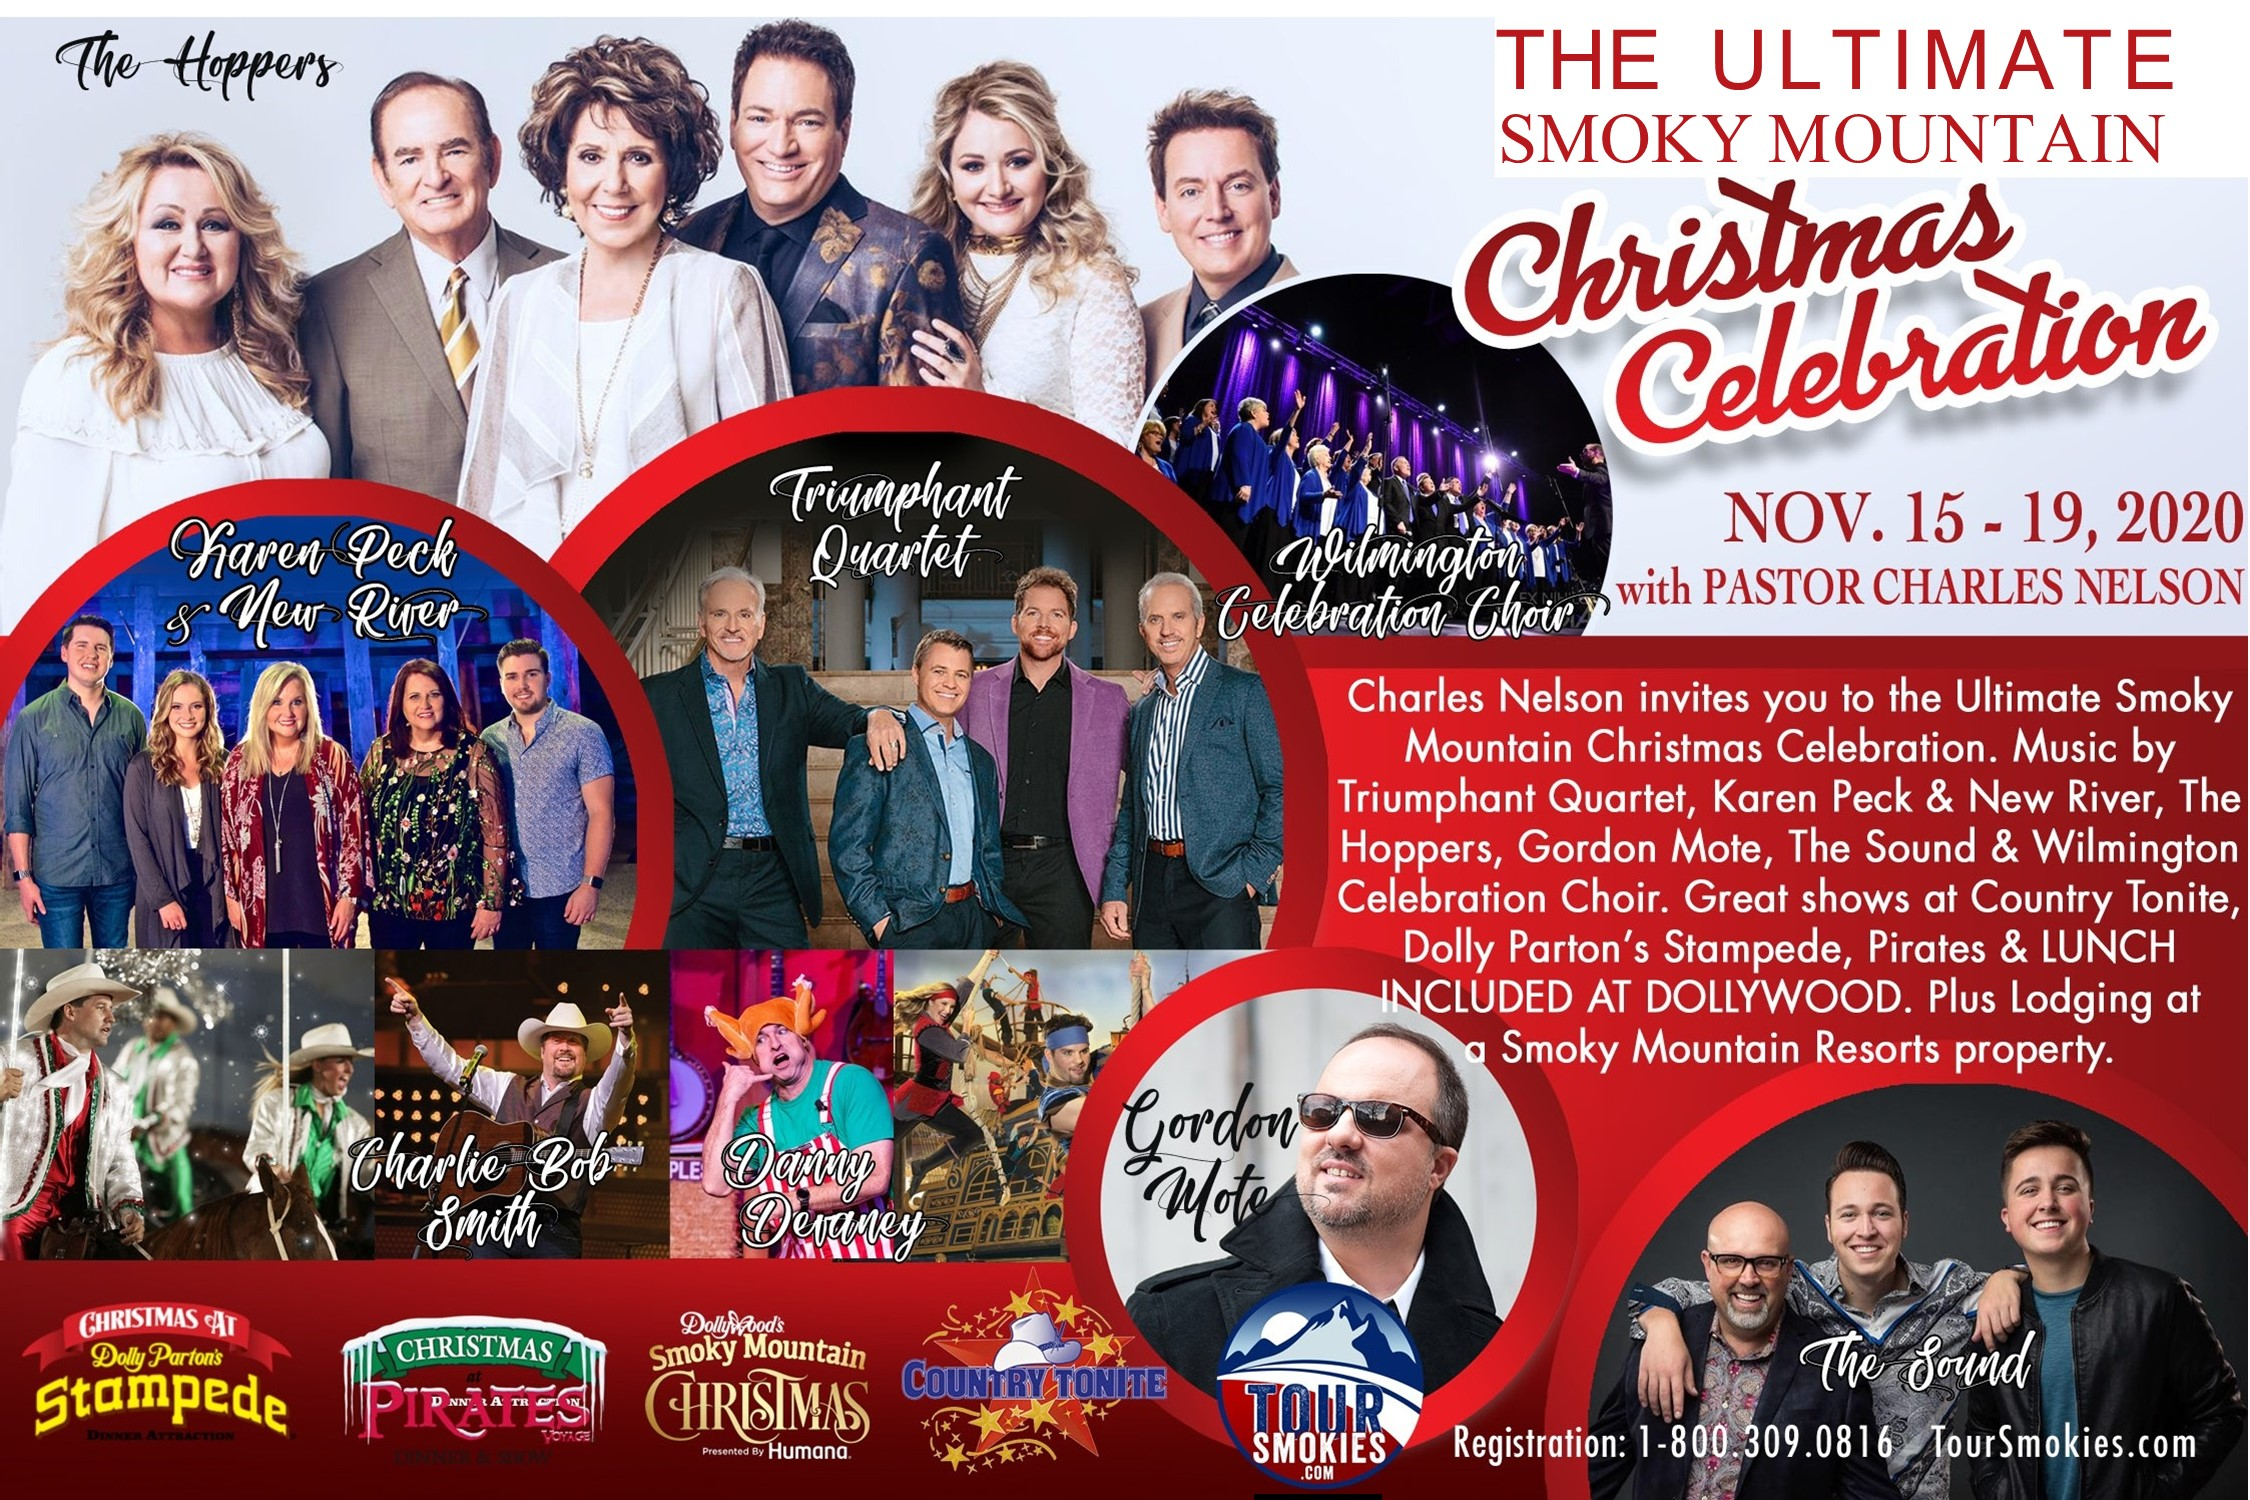 The Ultimate Smoky Mountain Christmas Celebration